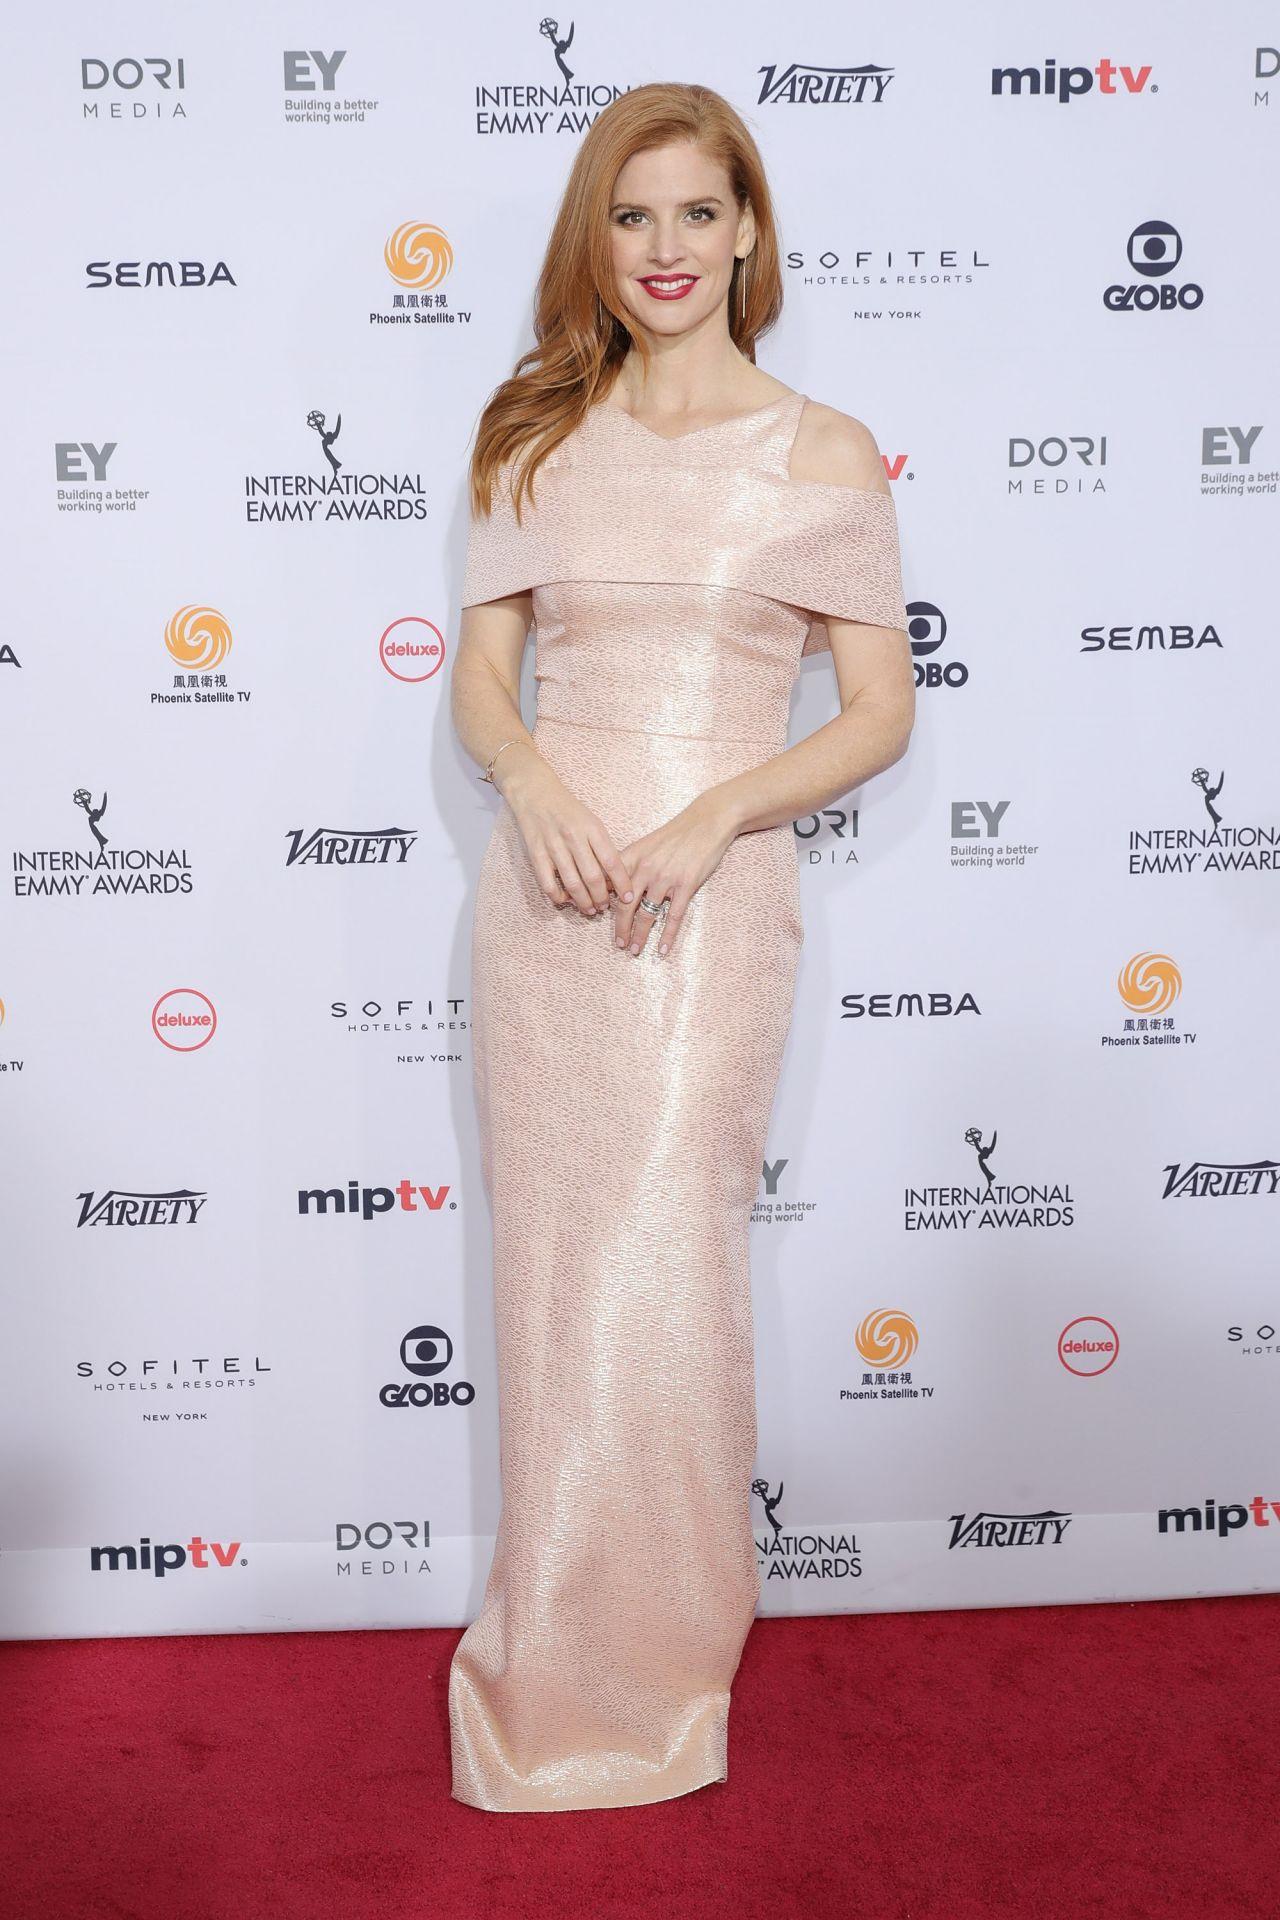 sarah-rafferty-international-emmy-awards-2016-in-new-york-city-2